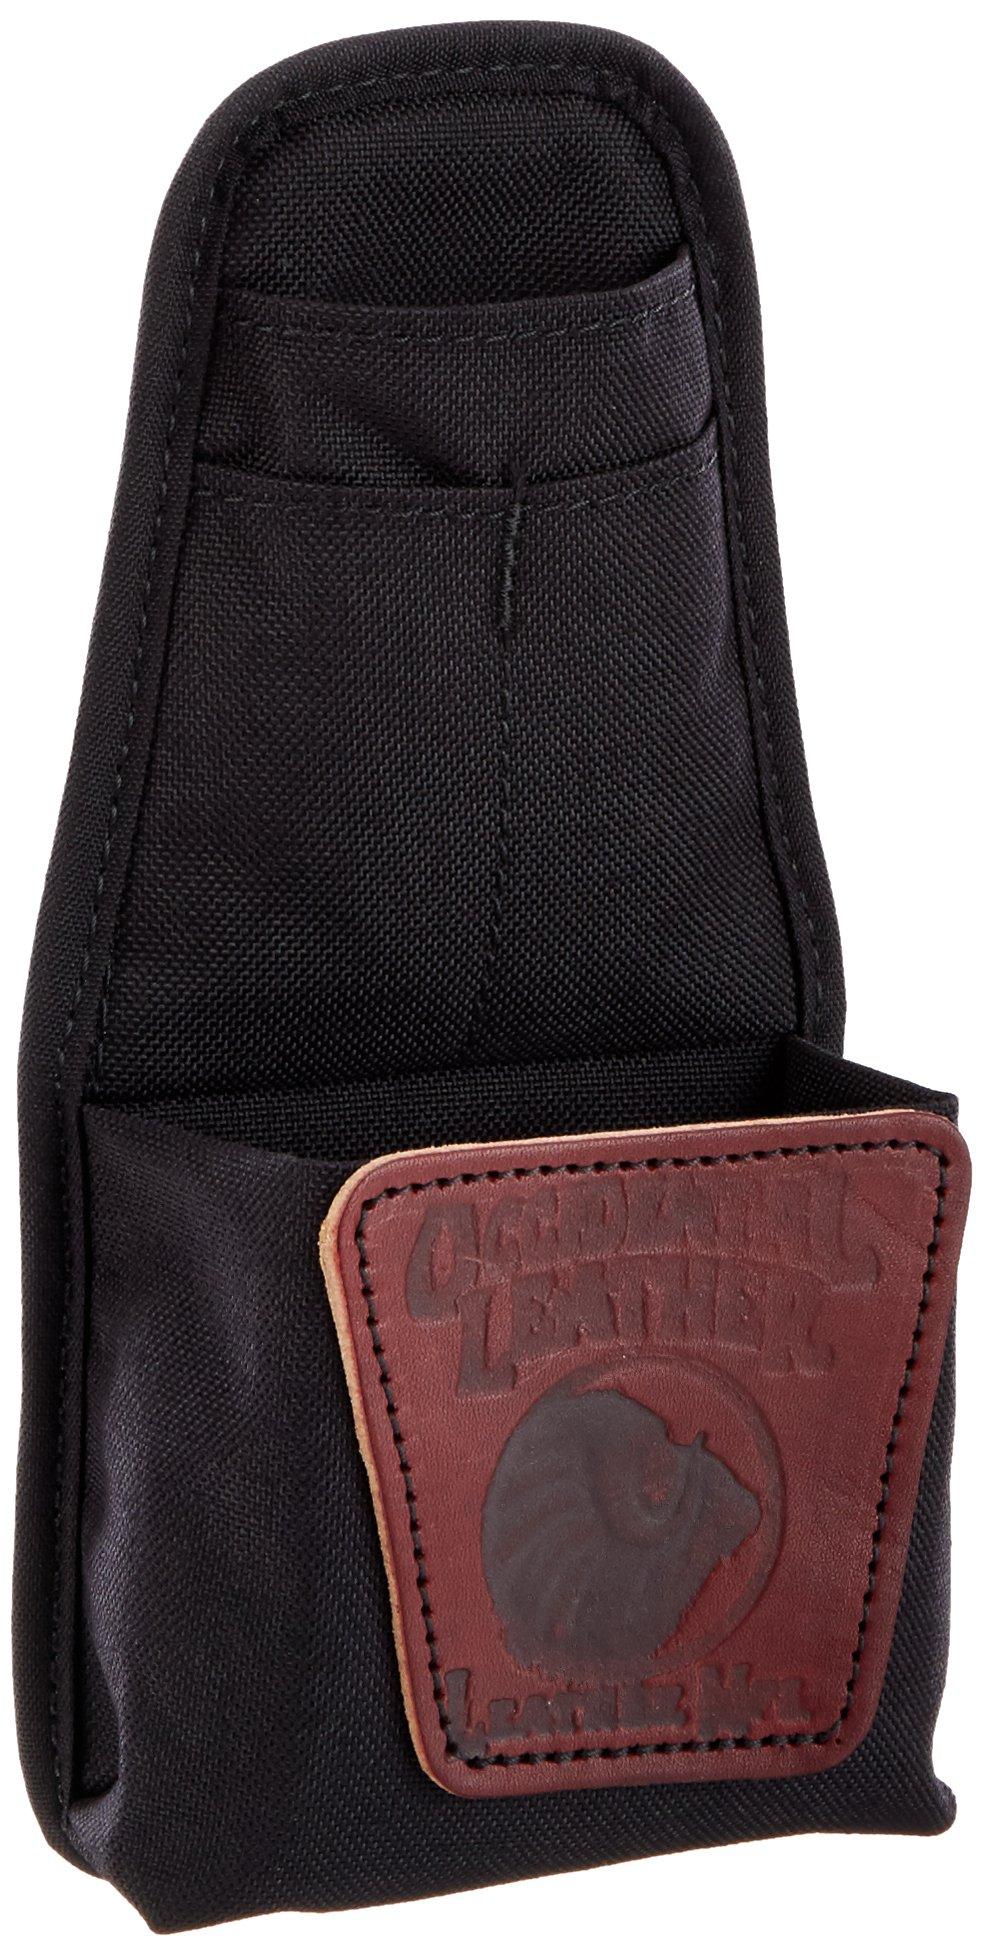 Occidental Leather 8505 4 Pocket Tool Holder